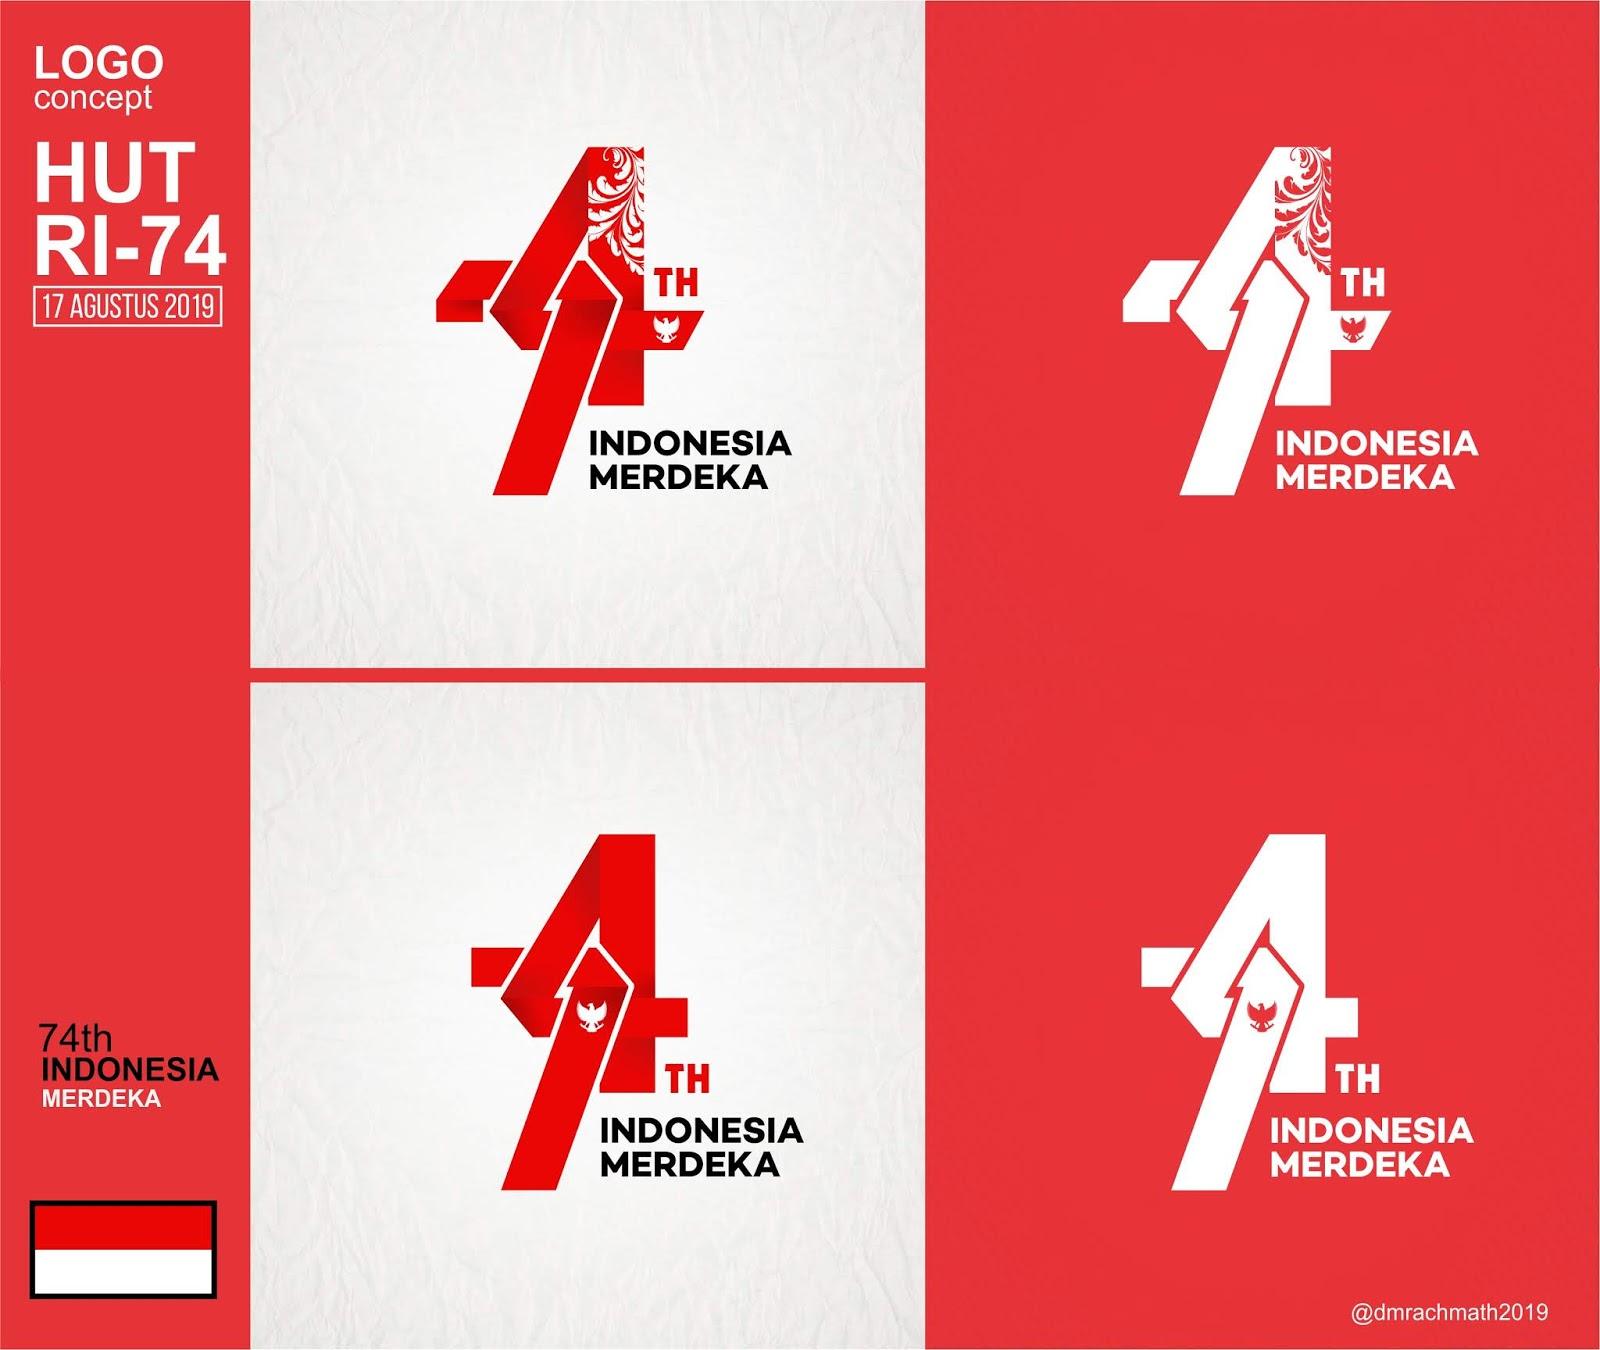 440+ Foto Desain Logo Hut Ri HD Unduh Gratis